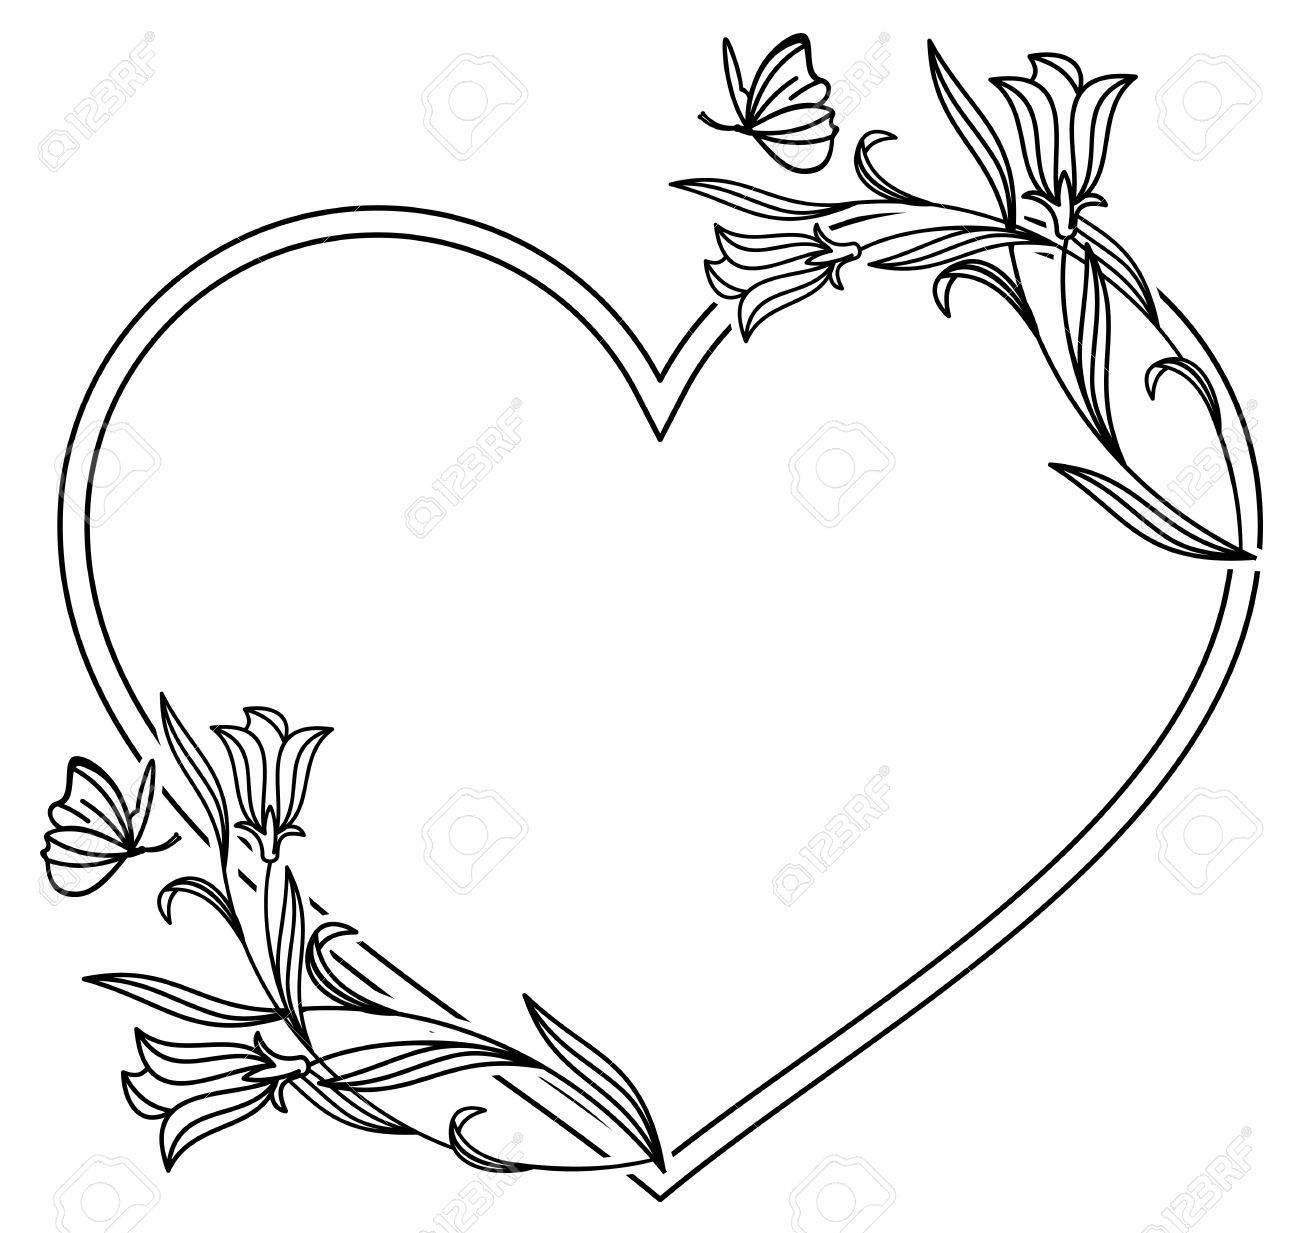 Heart Shaped Clipart